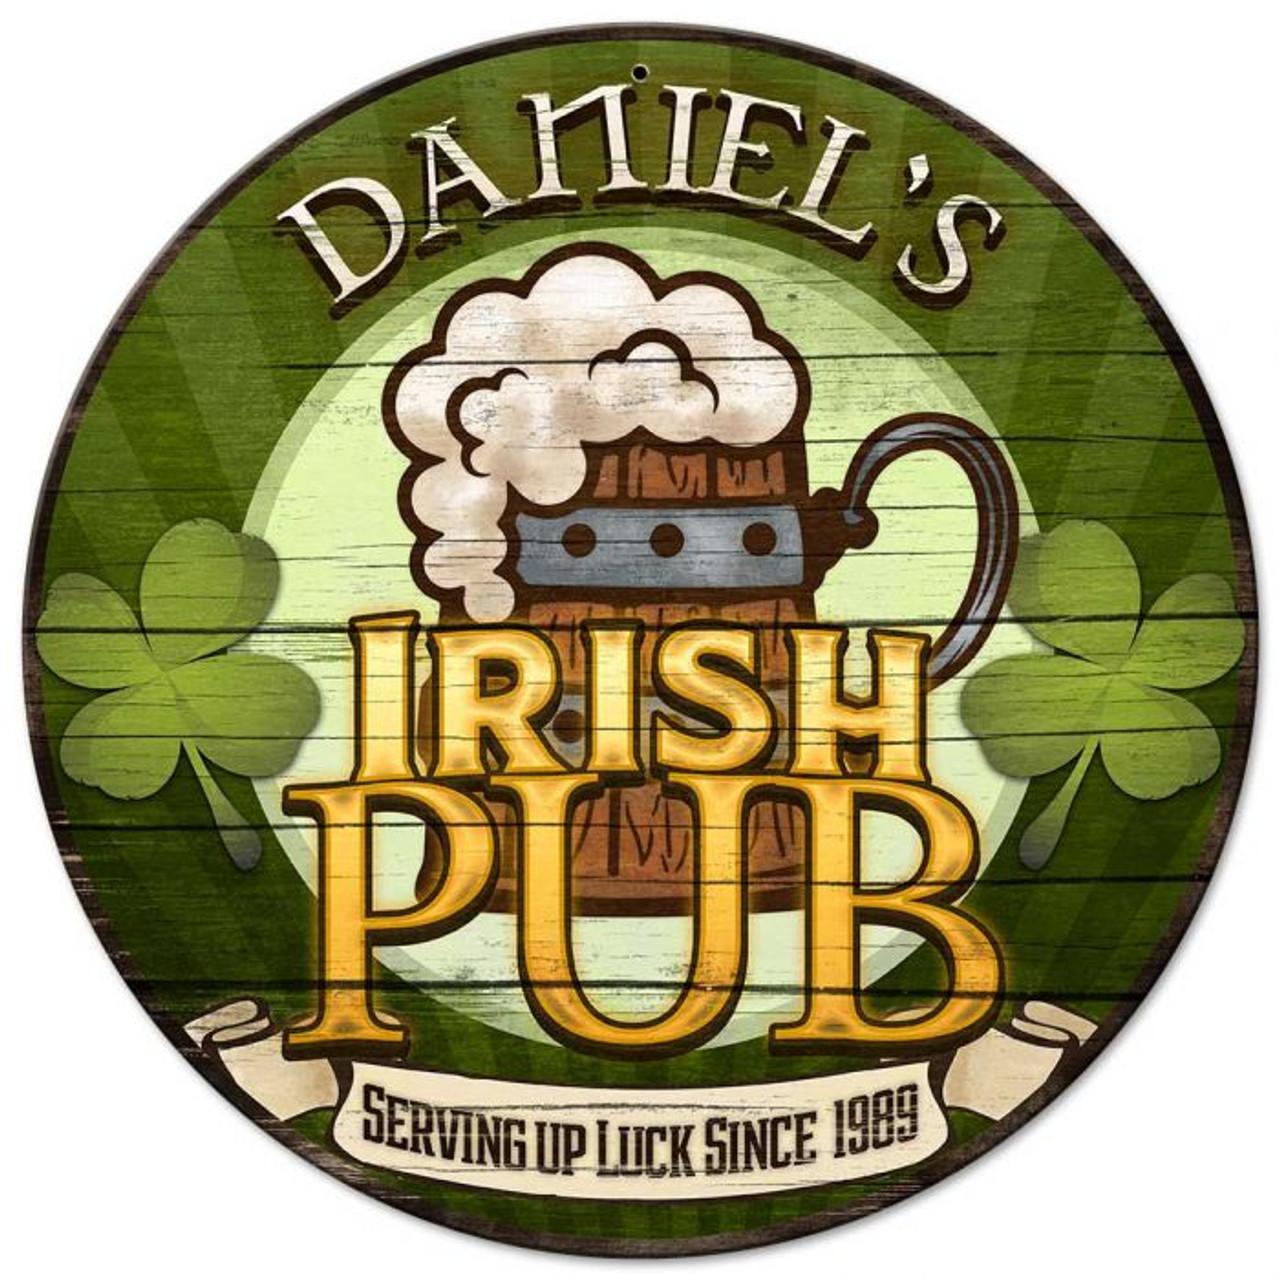 Irish Pub Round Metal Sign - Personalized 14 x 14 Inches